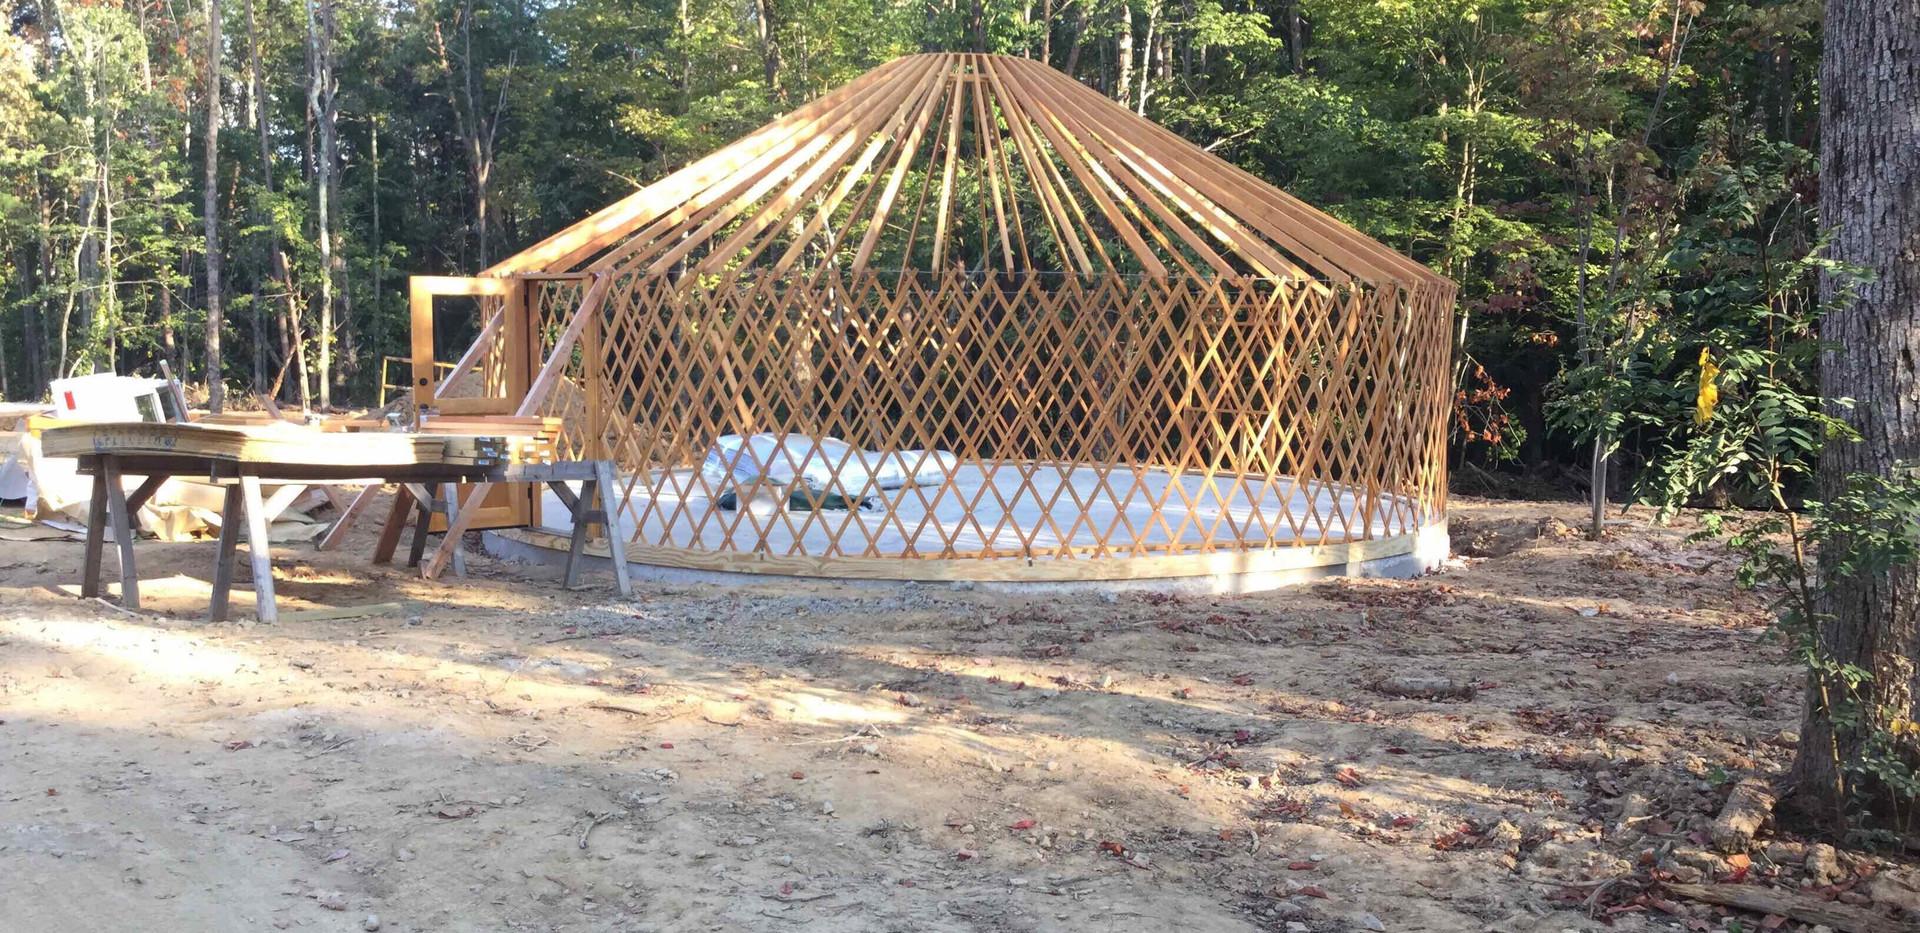 Yurt Construction - View 5